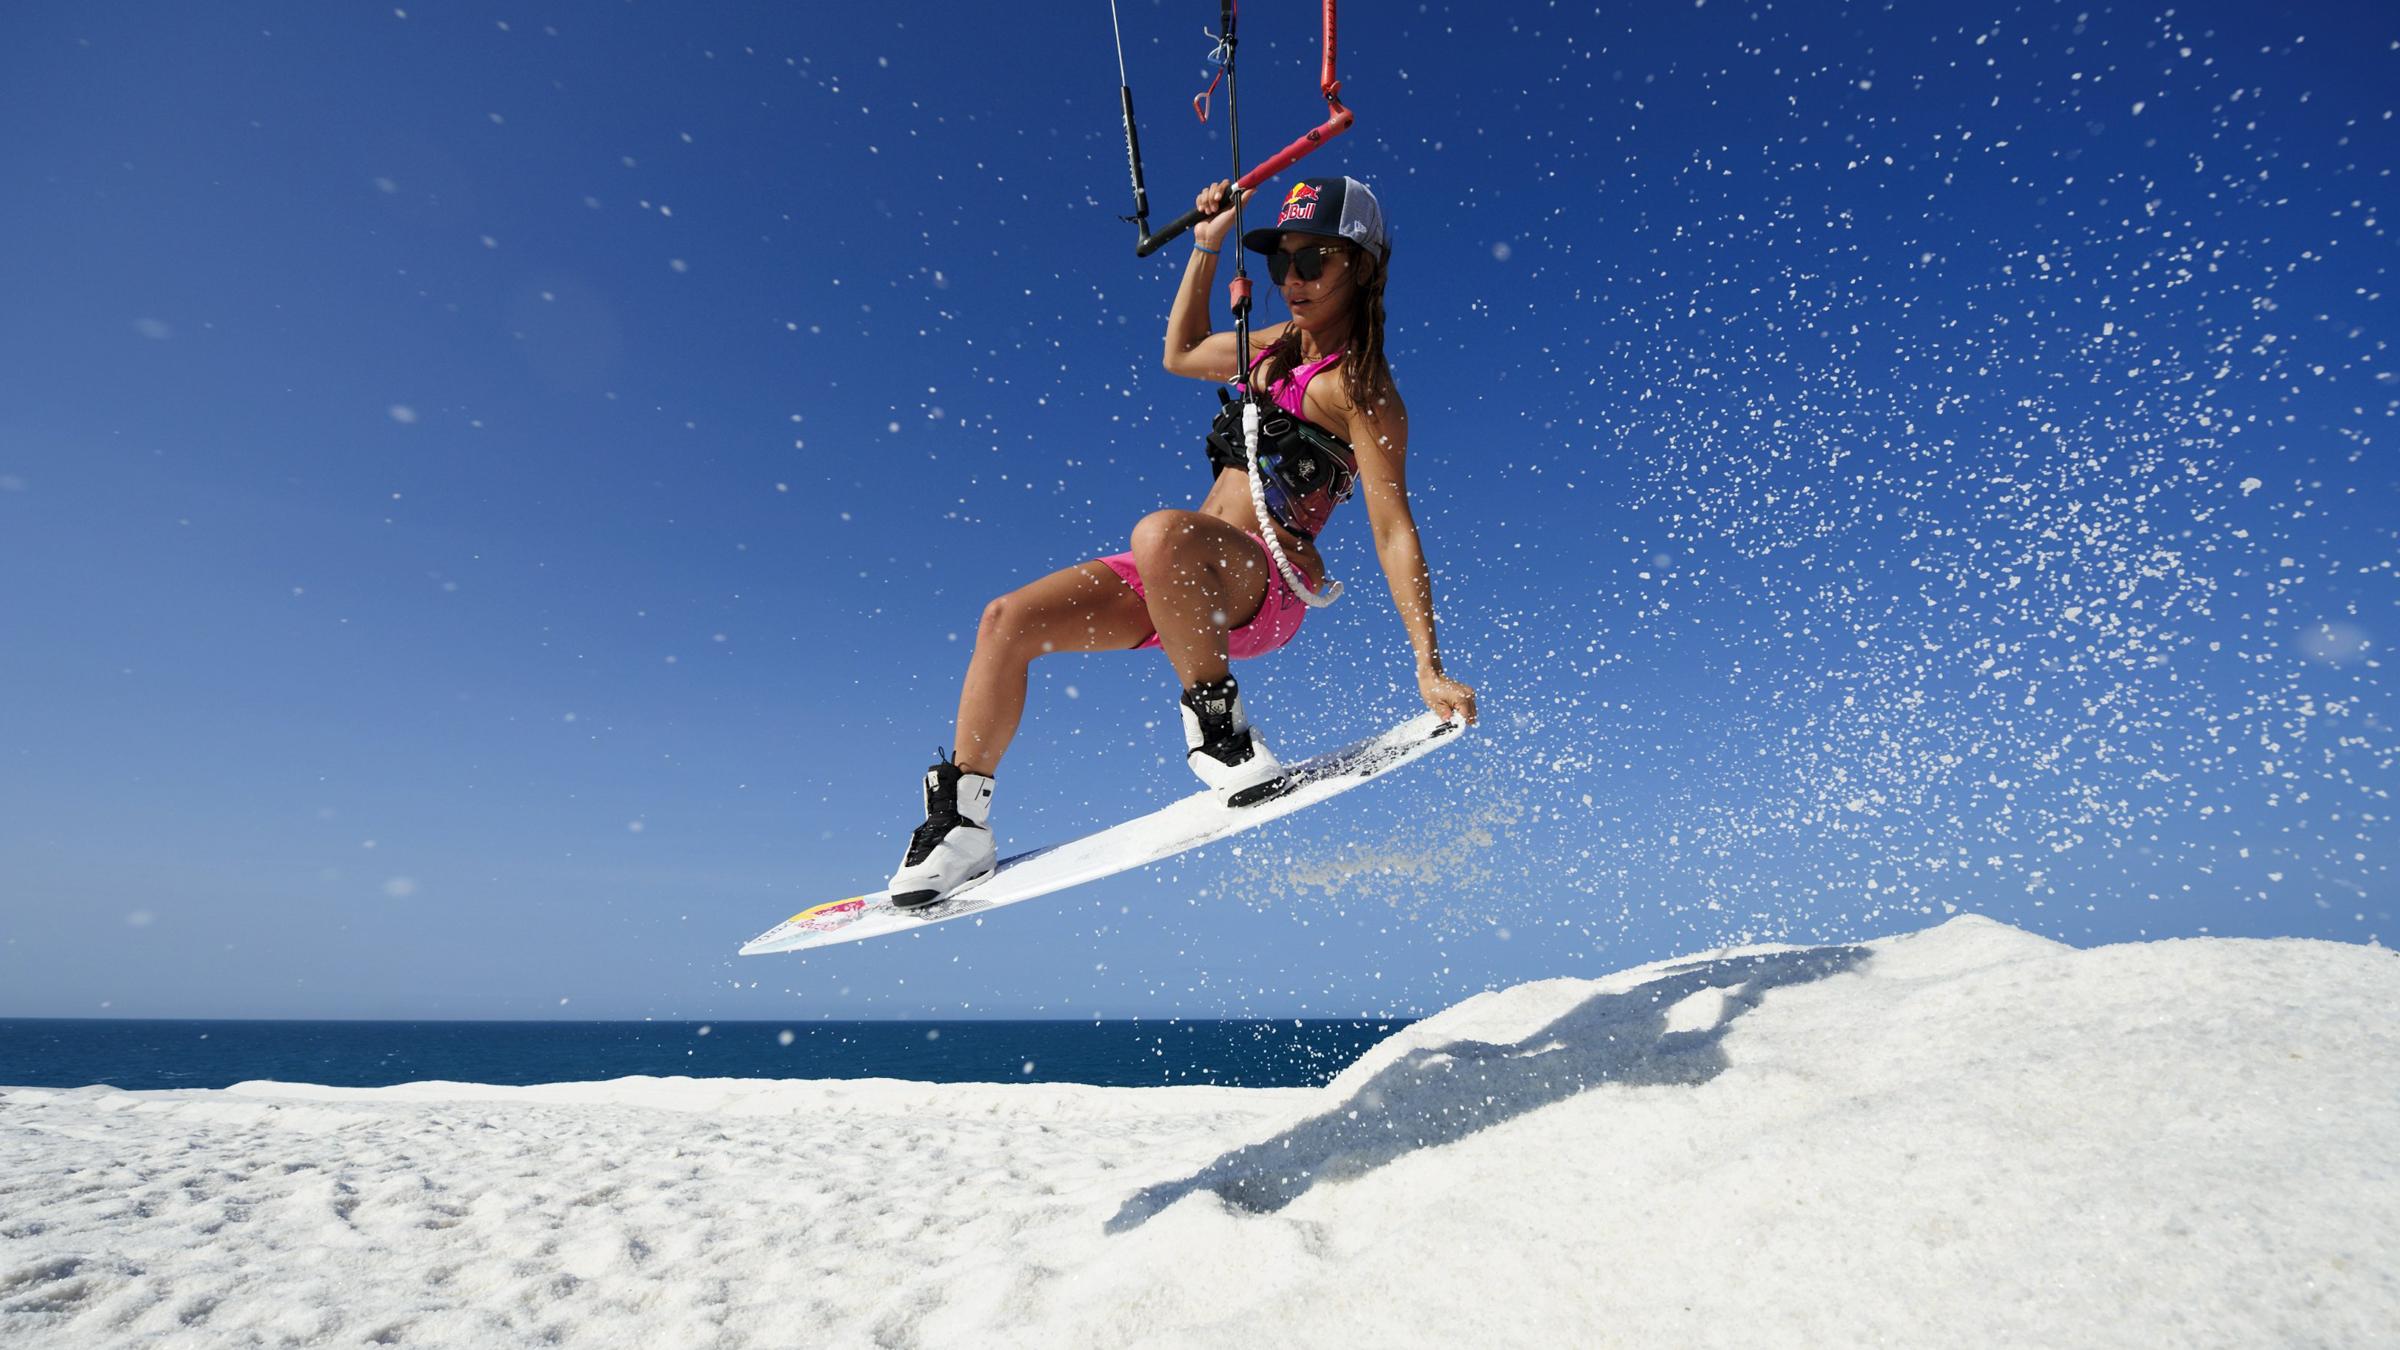 kitesurf wallpaper image - Bruna Kajiya jumping from salt mountain - in resolution: High Definition - HD 16:9 2400 X 1350